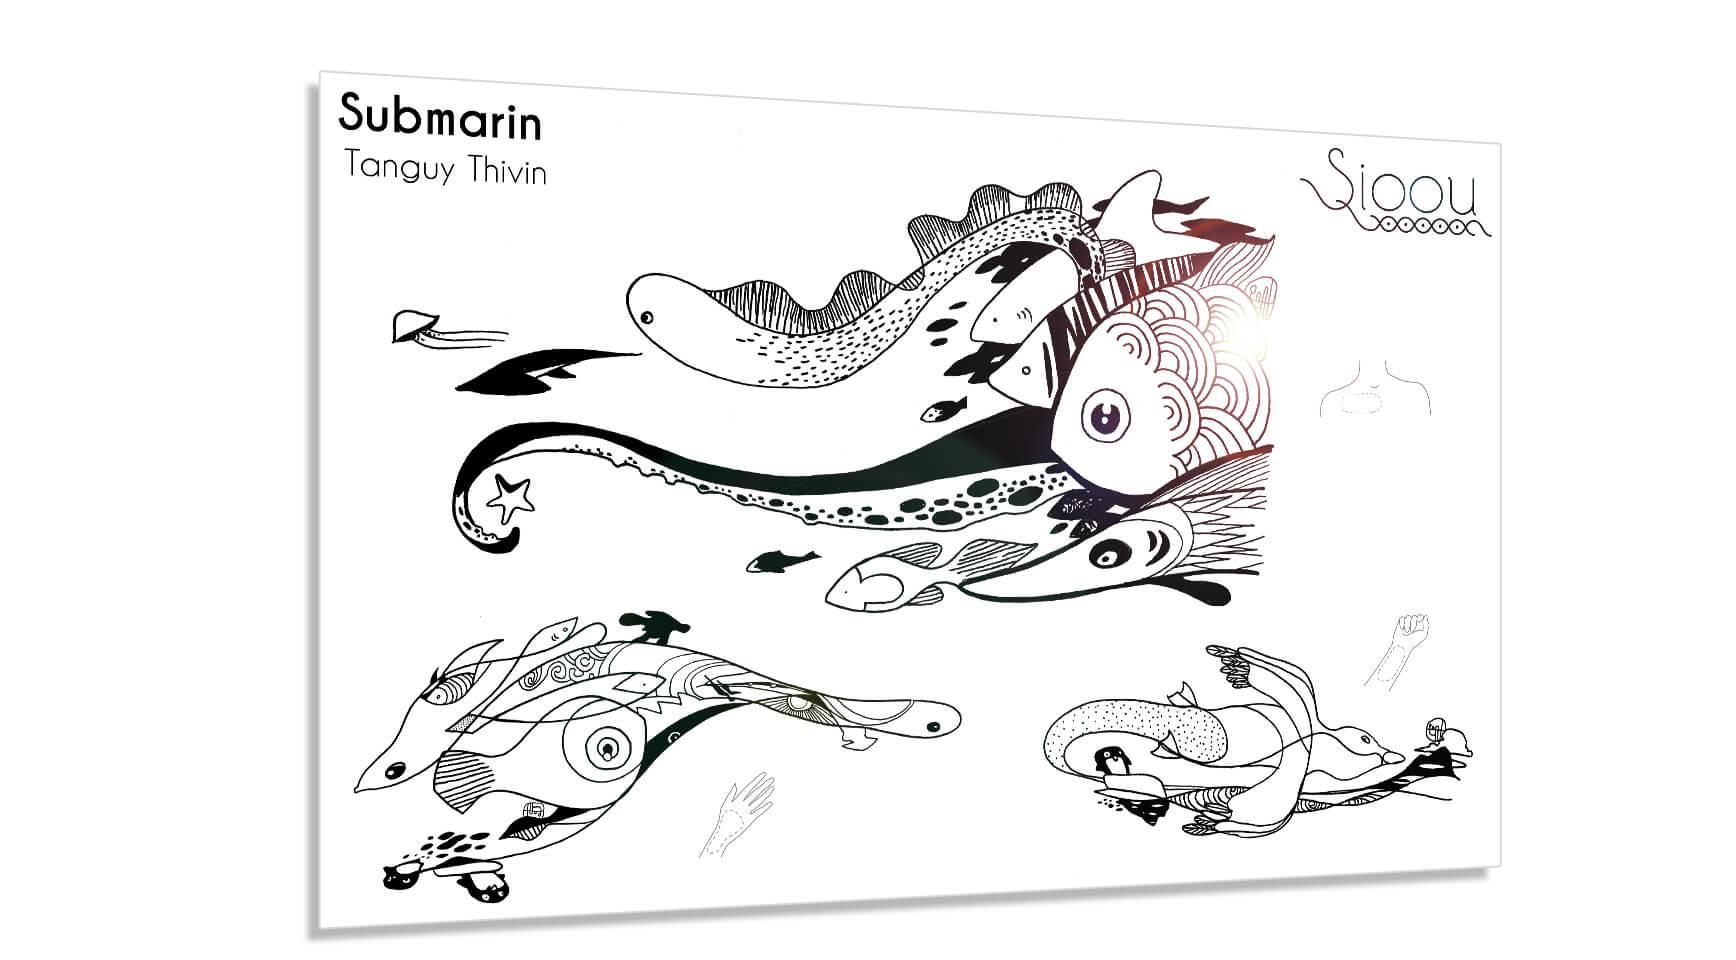 Parure de tattoos Sioou Submarin dessinée par Tang